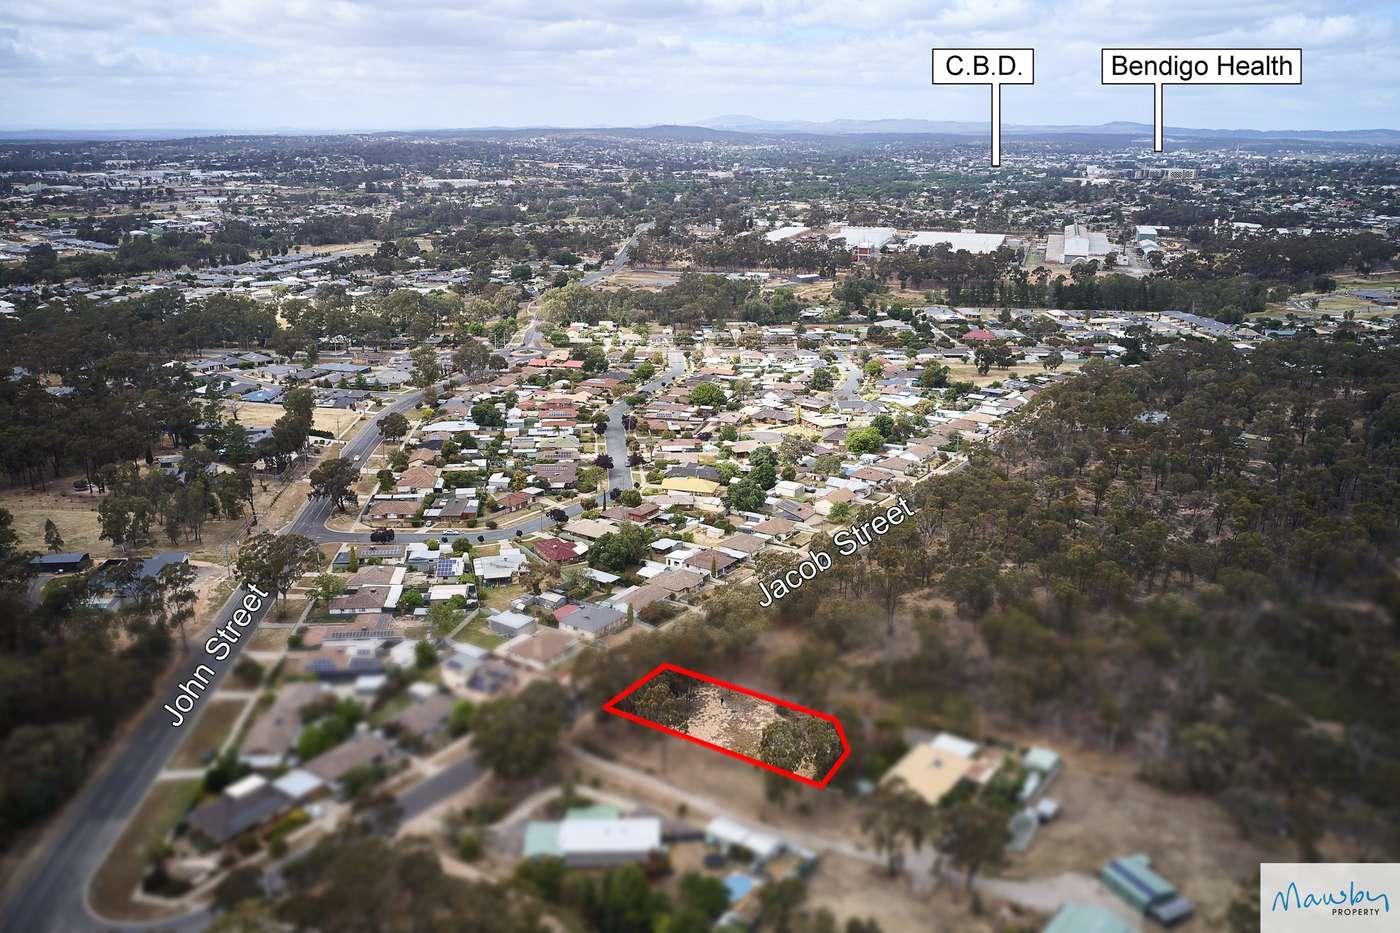 Main view of Homely  listing, 55 Jacob Street, North Bendigo, VIC 3550